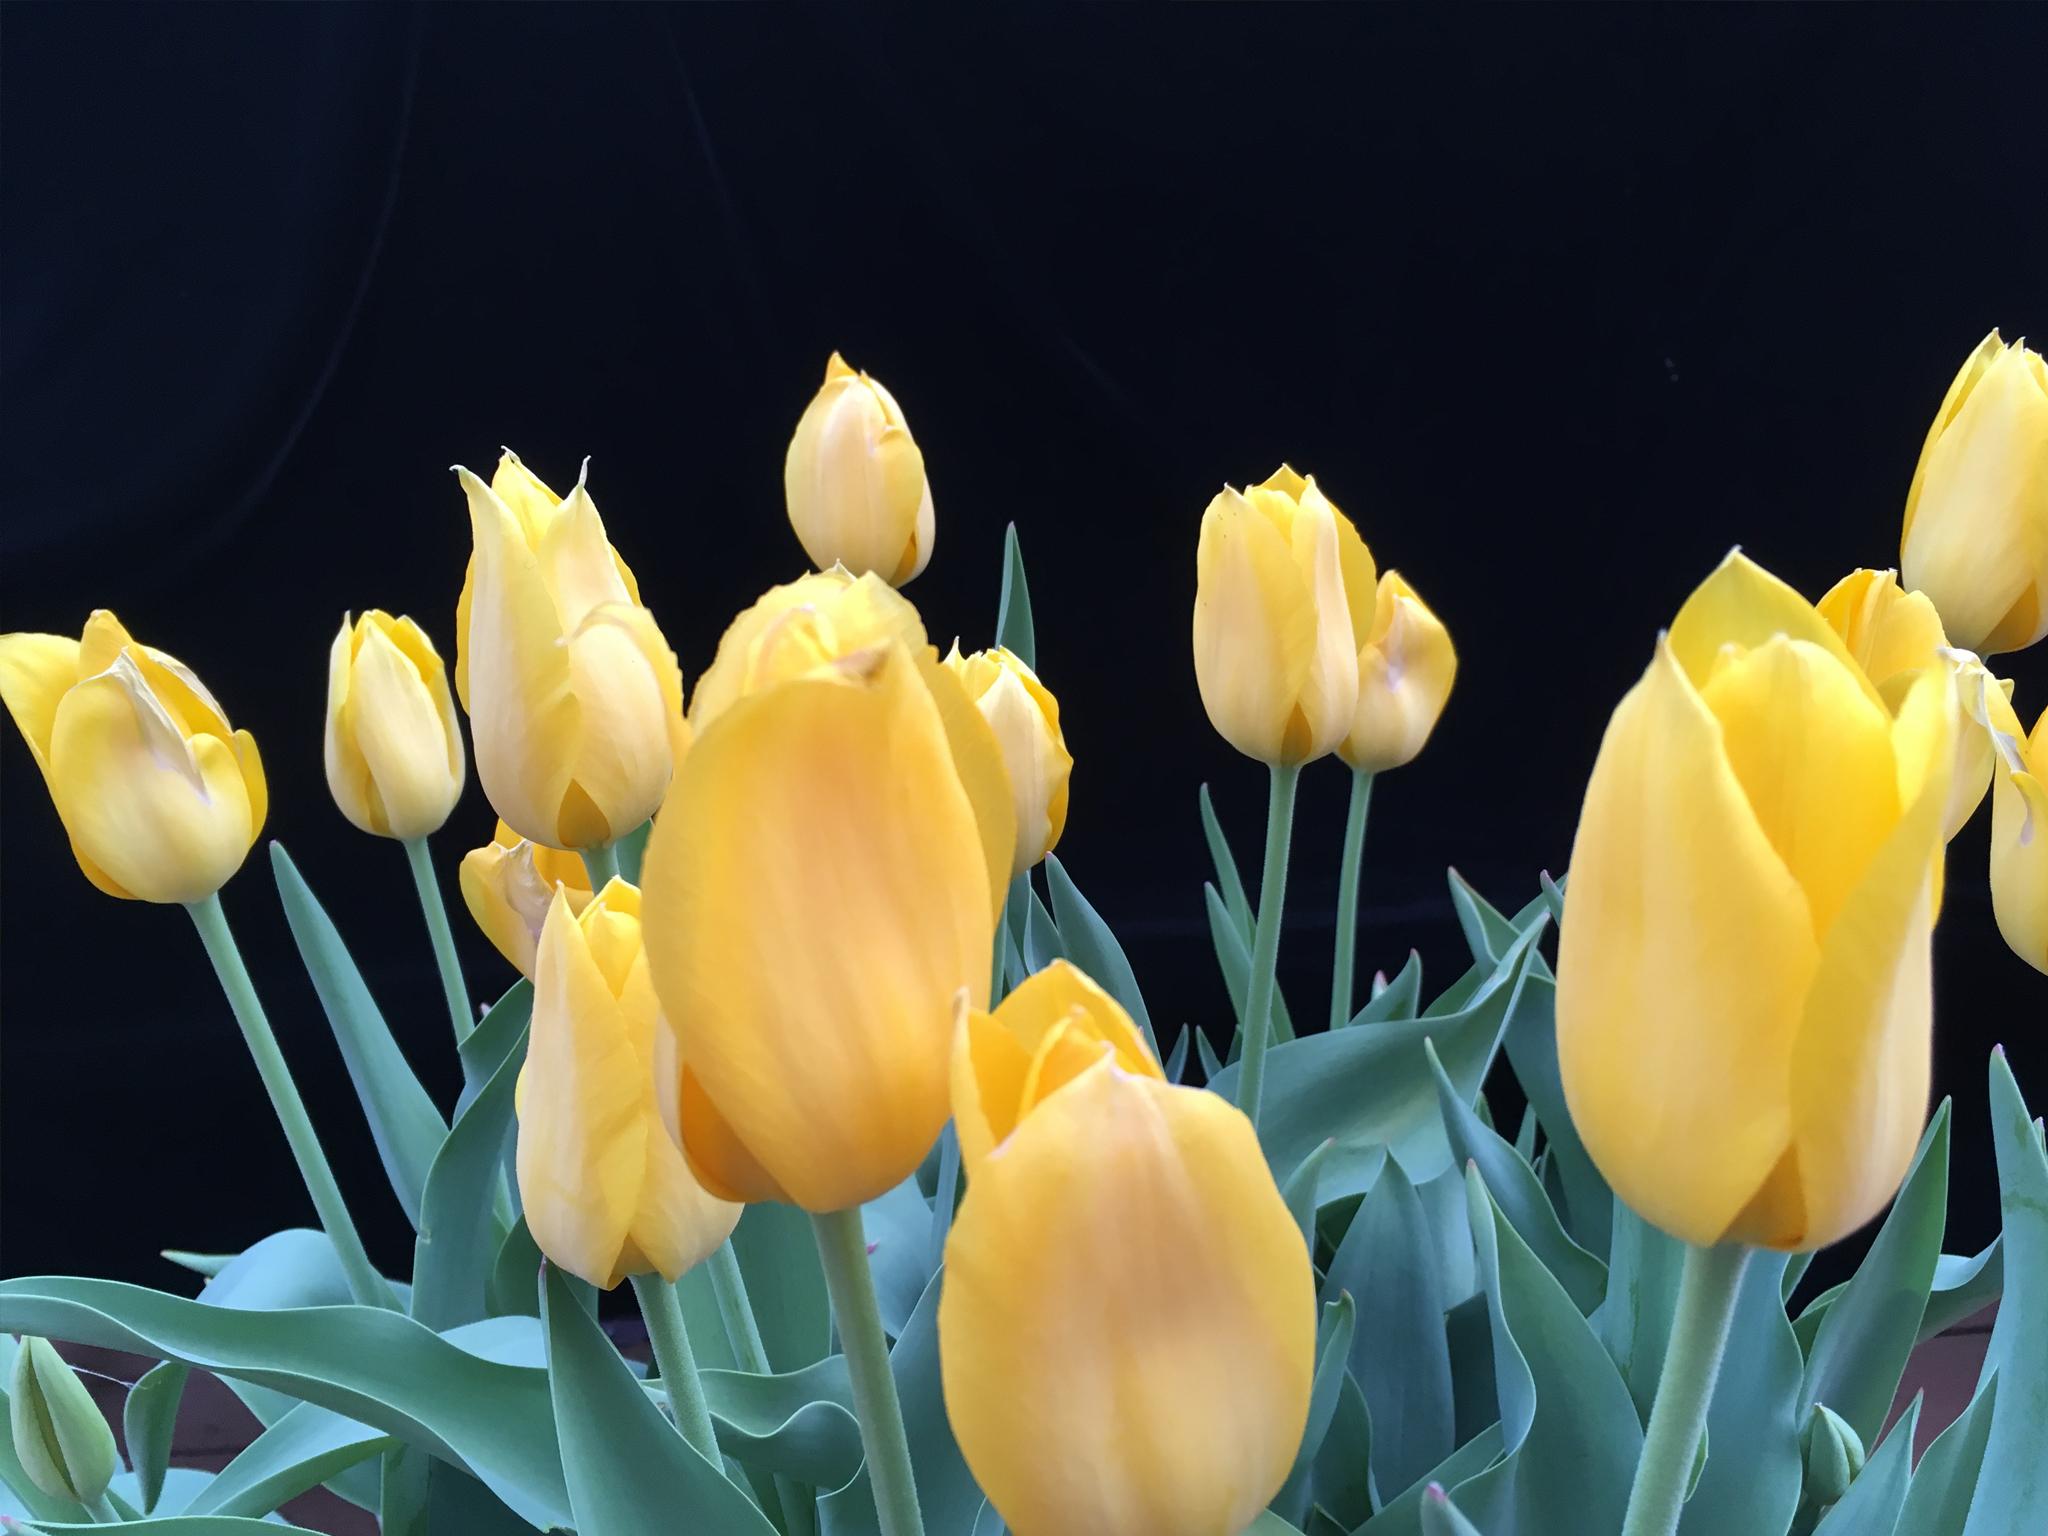 flower bloom 04